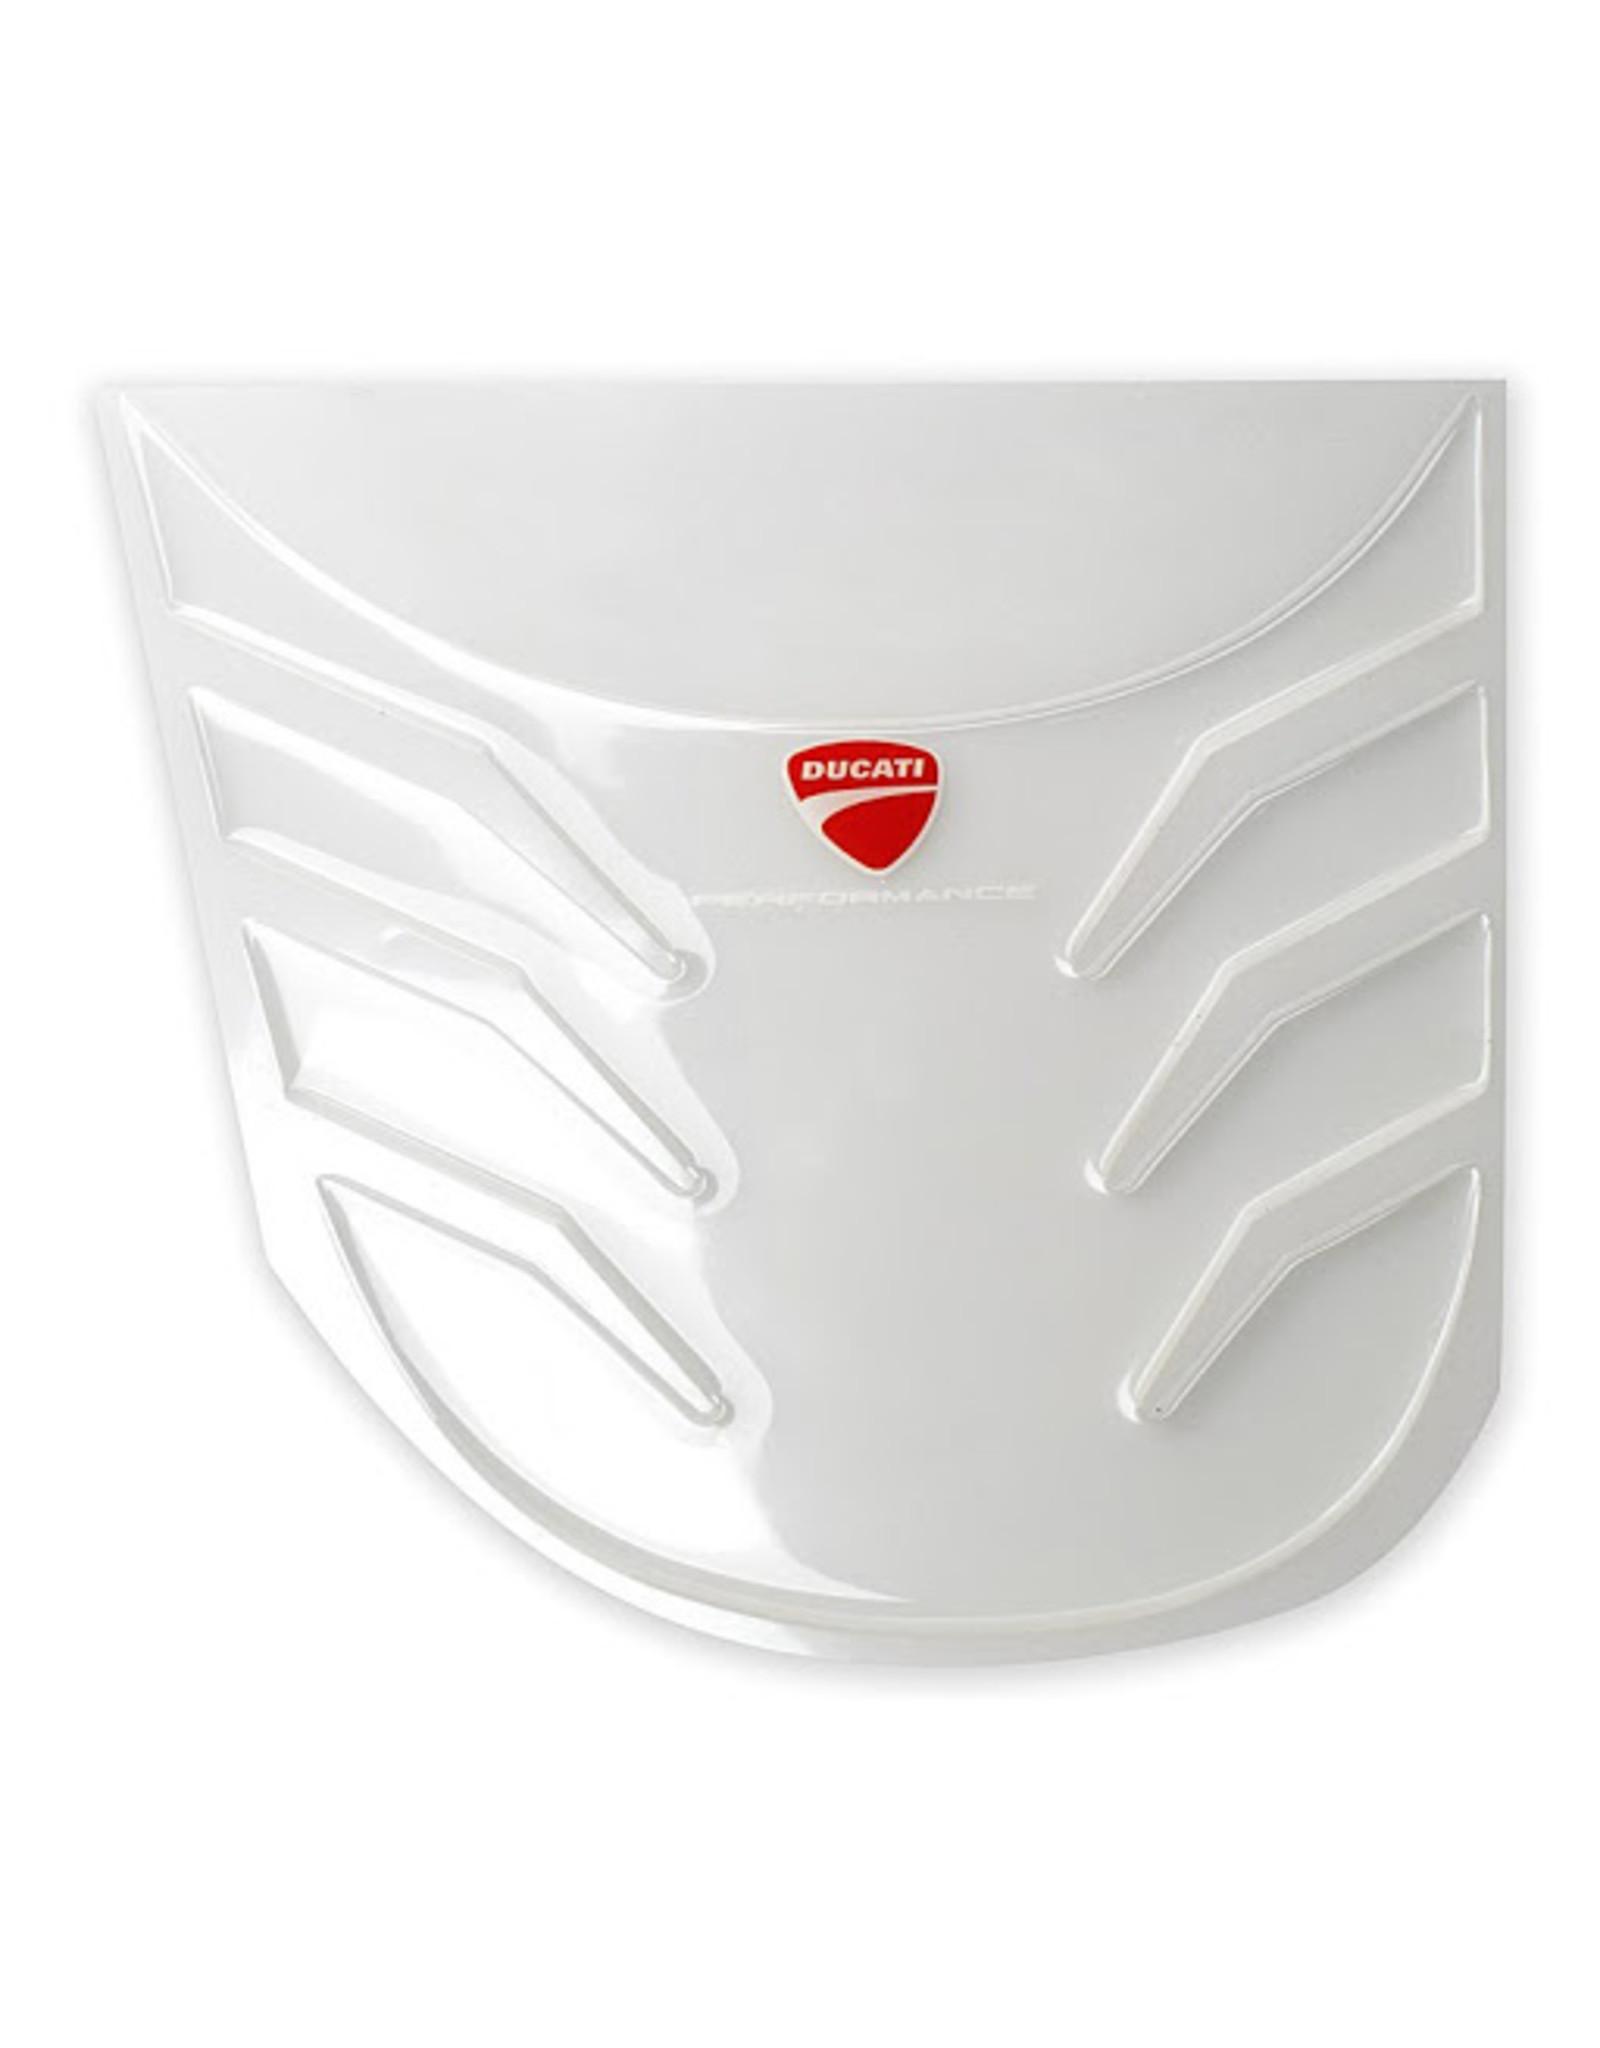 Ducati DUCATI PERFORMANCE CLEAR FUEL TANK PROTECTOR PAD MTS 1200   96784310B